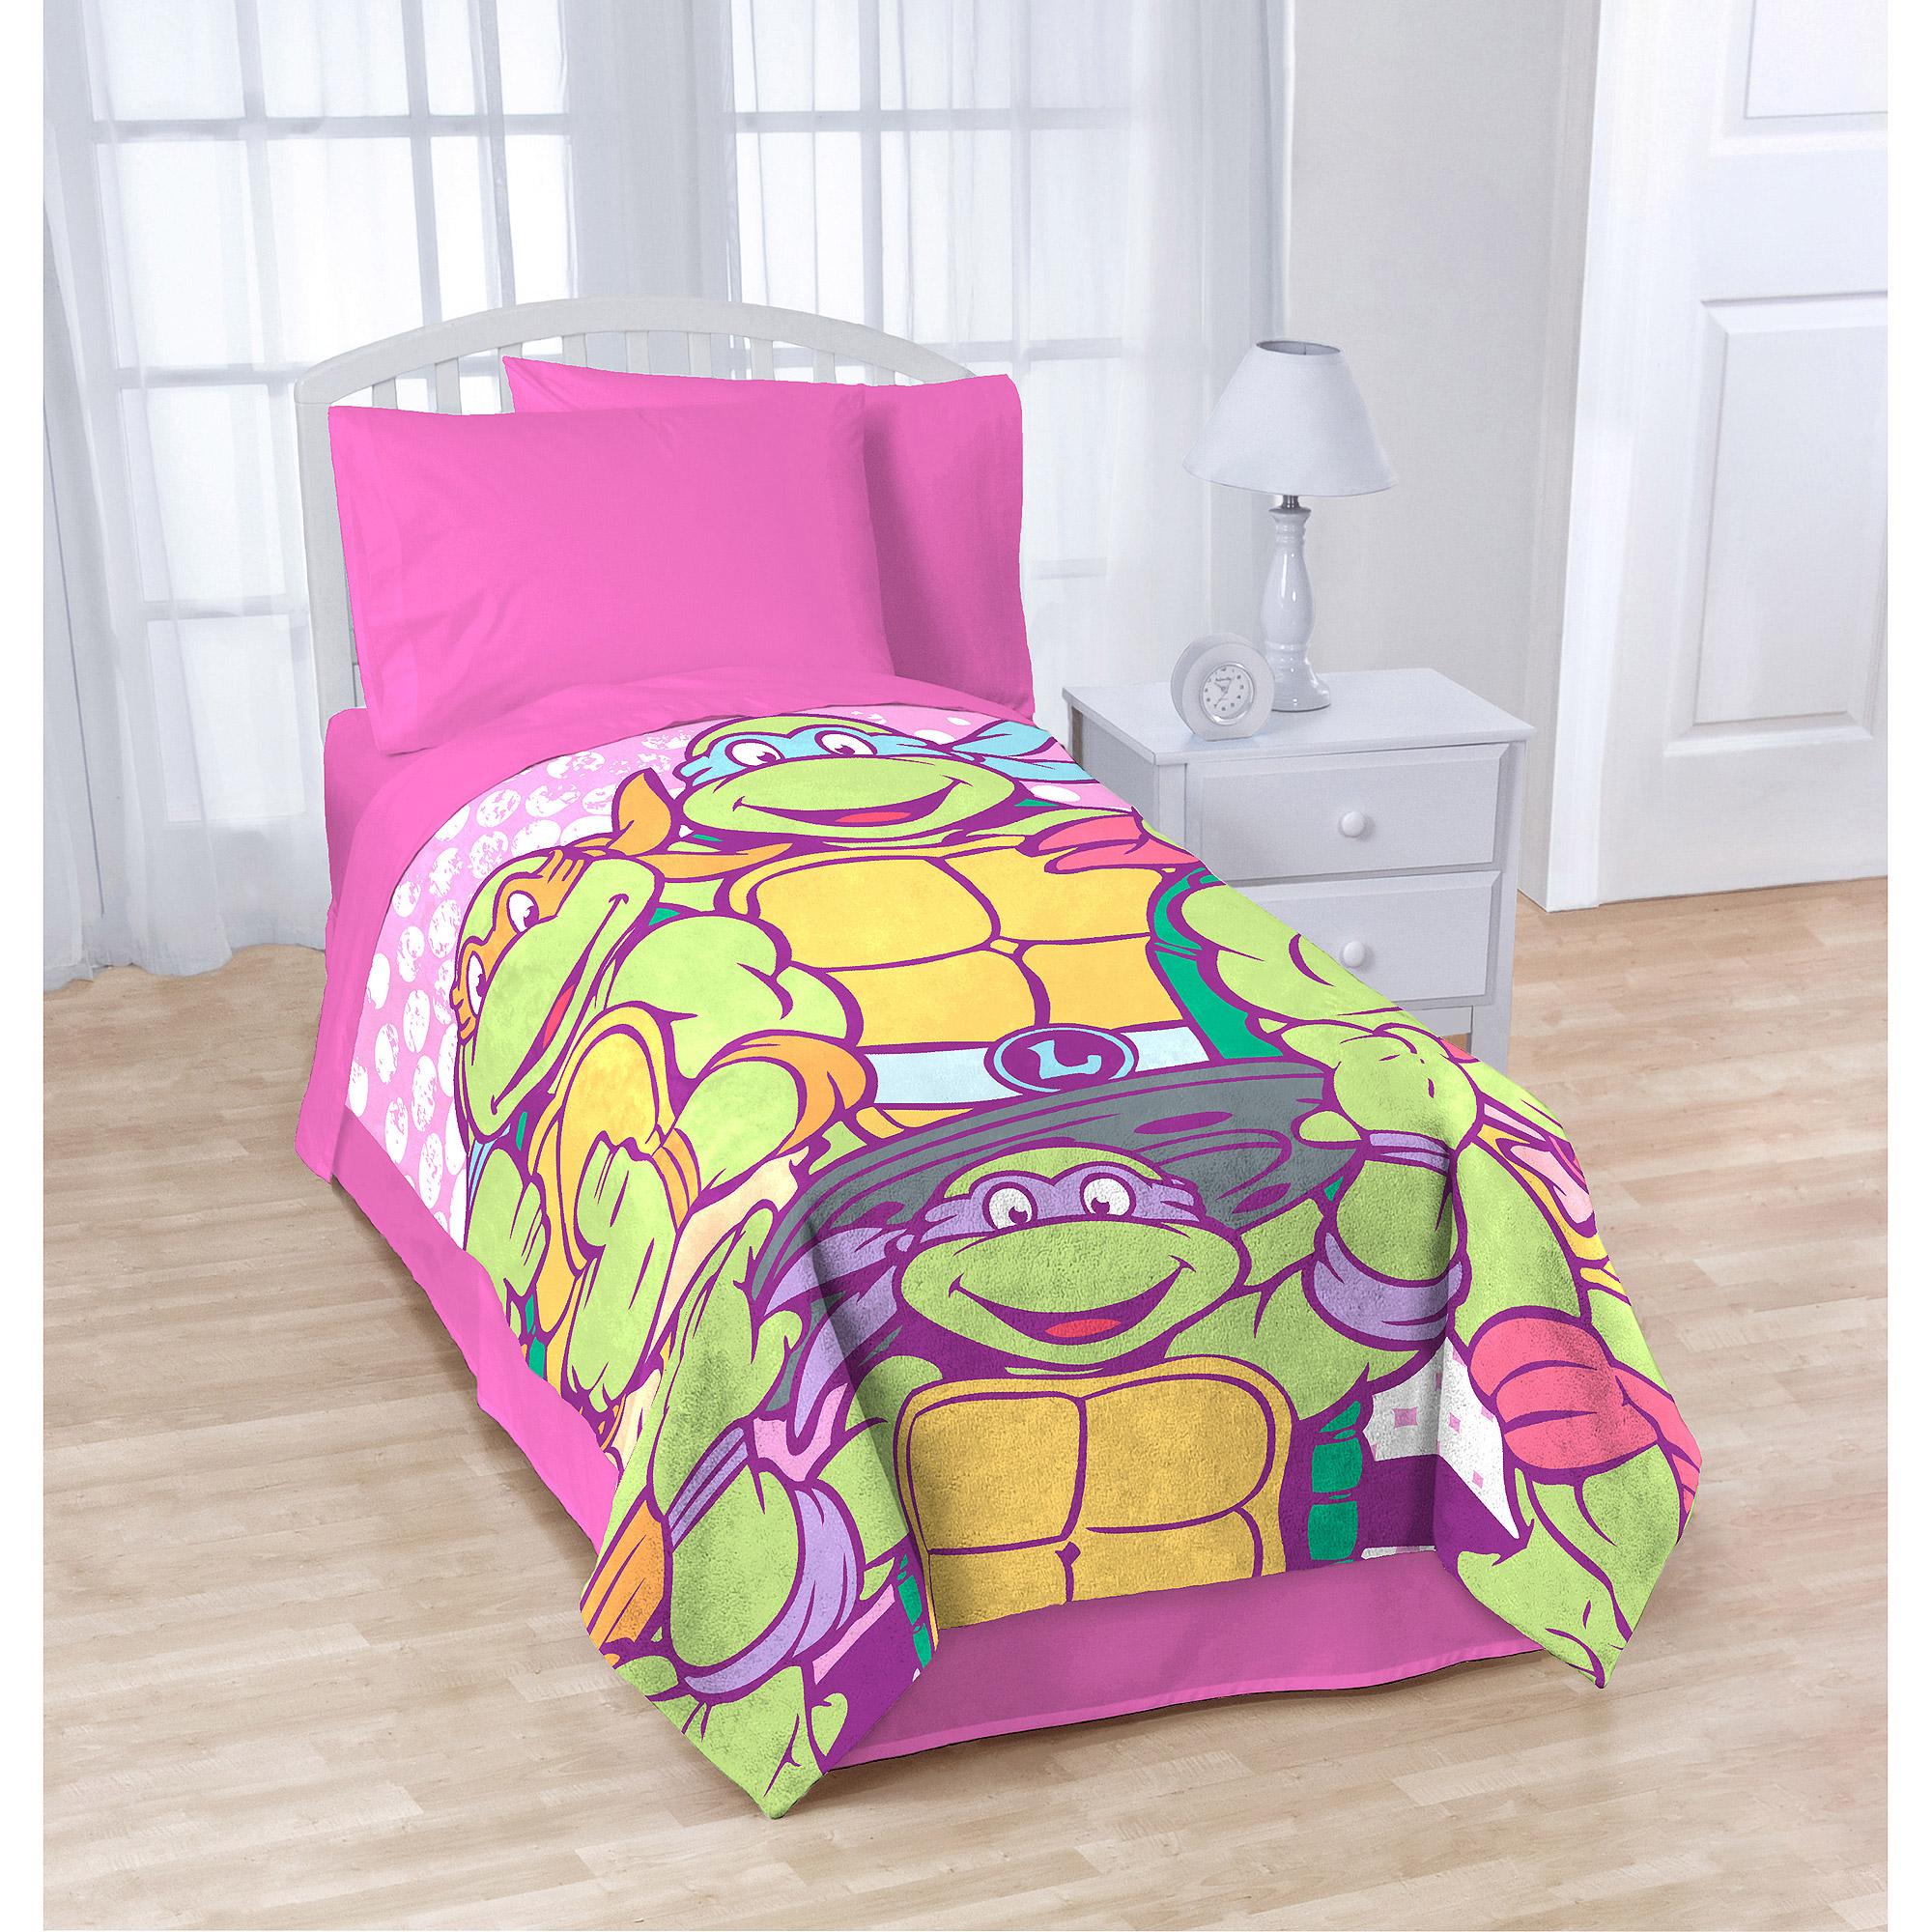 "Nickelodeon Teenage Mutant Ninja Turtles ""SHELLASTIC"" Blanket"